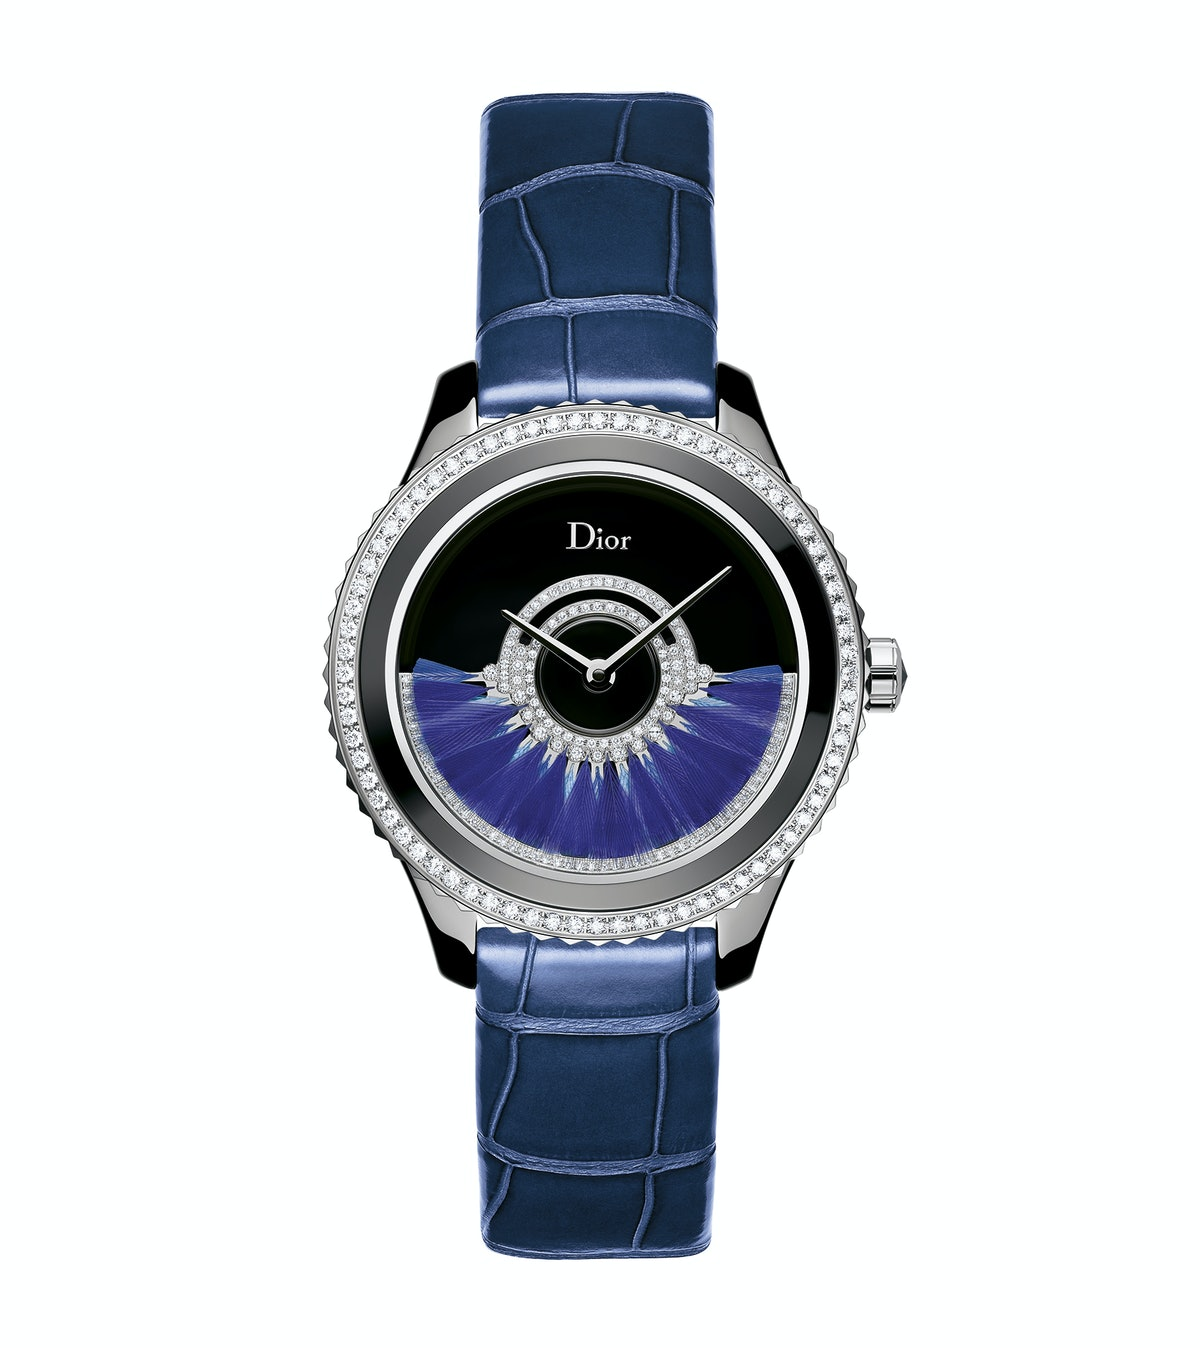 Dior Timepieces ceramic and diamond watch